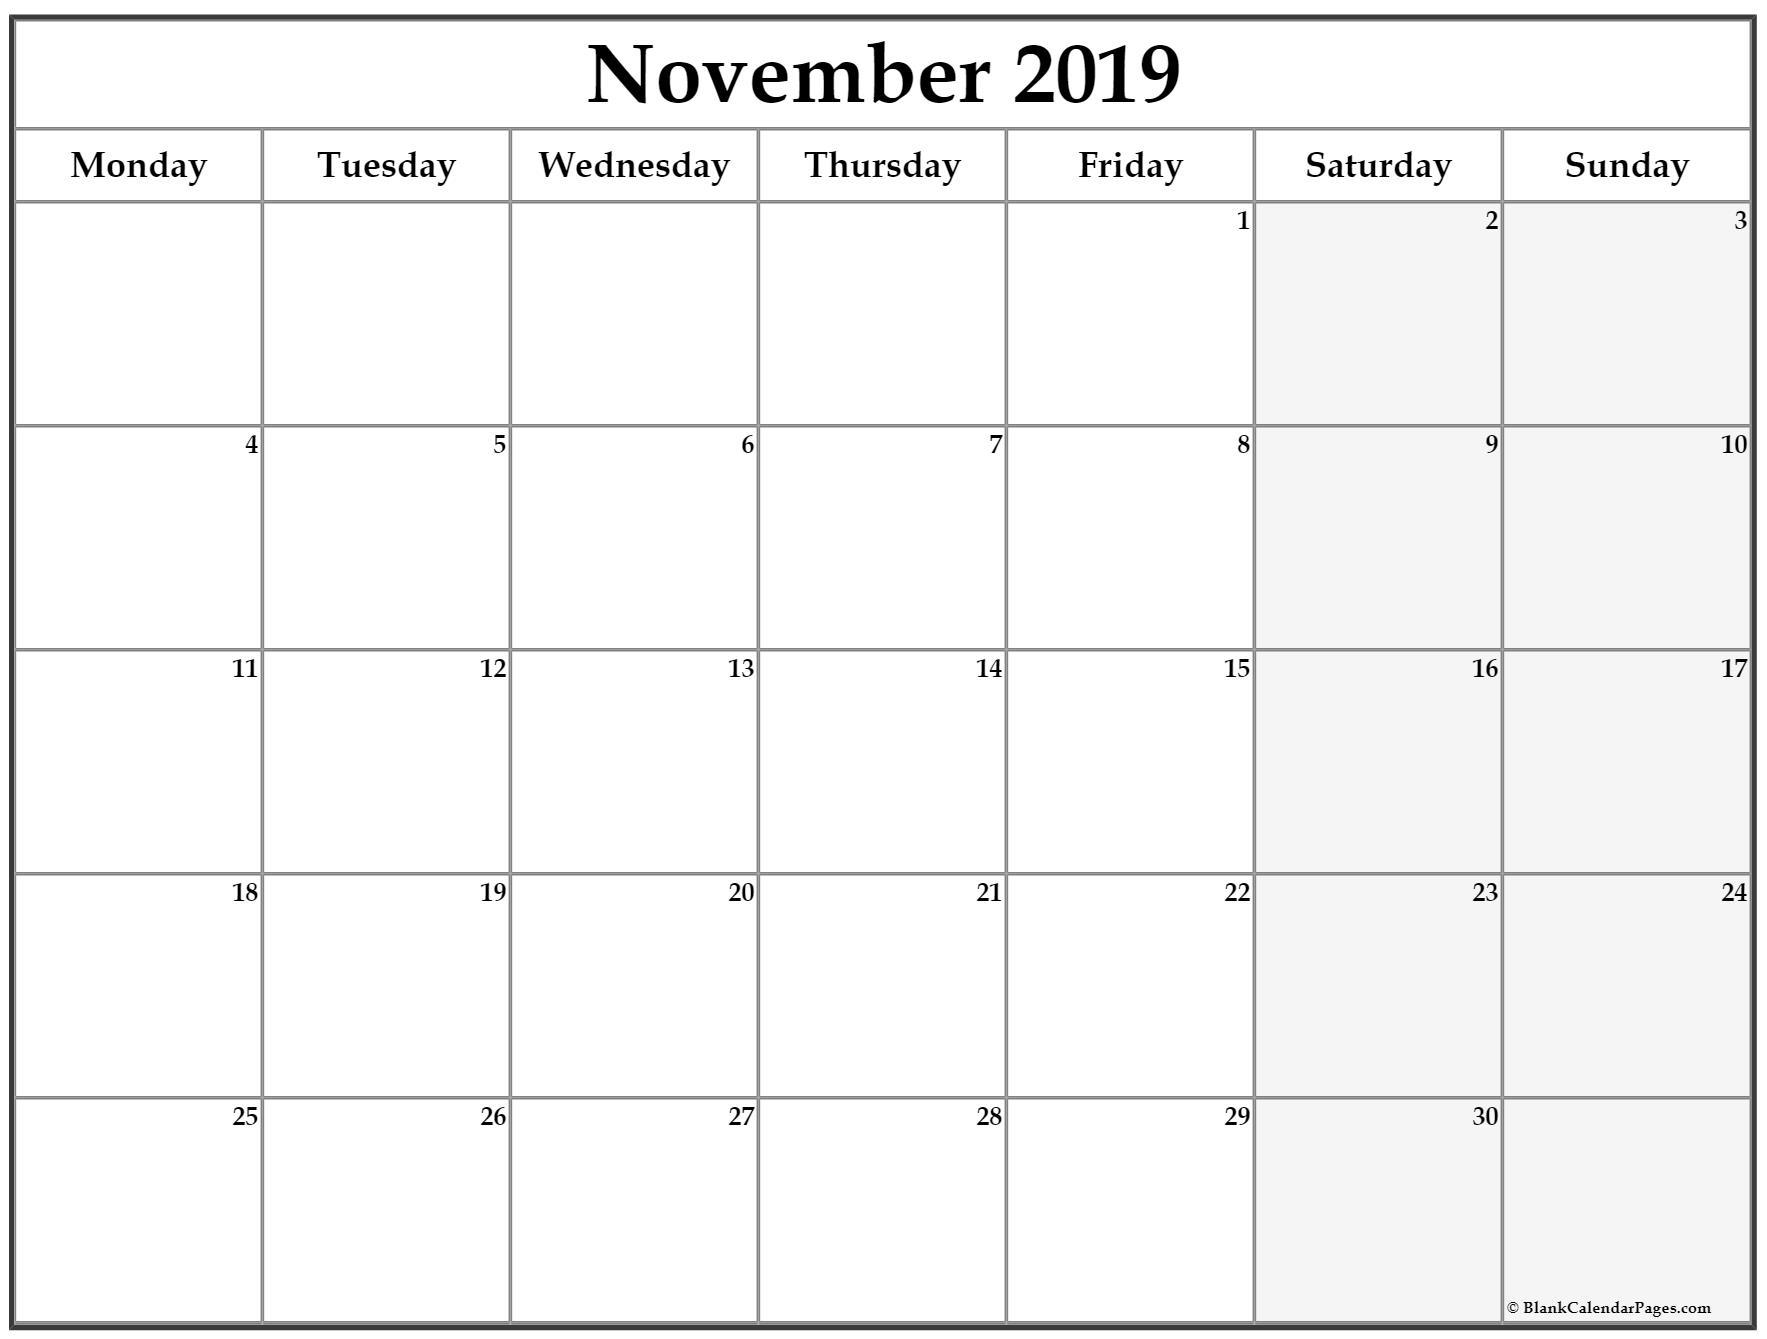 November 2019 Monday Calendar | Monday To Sunday